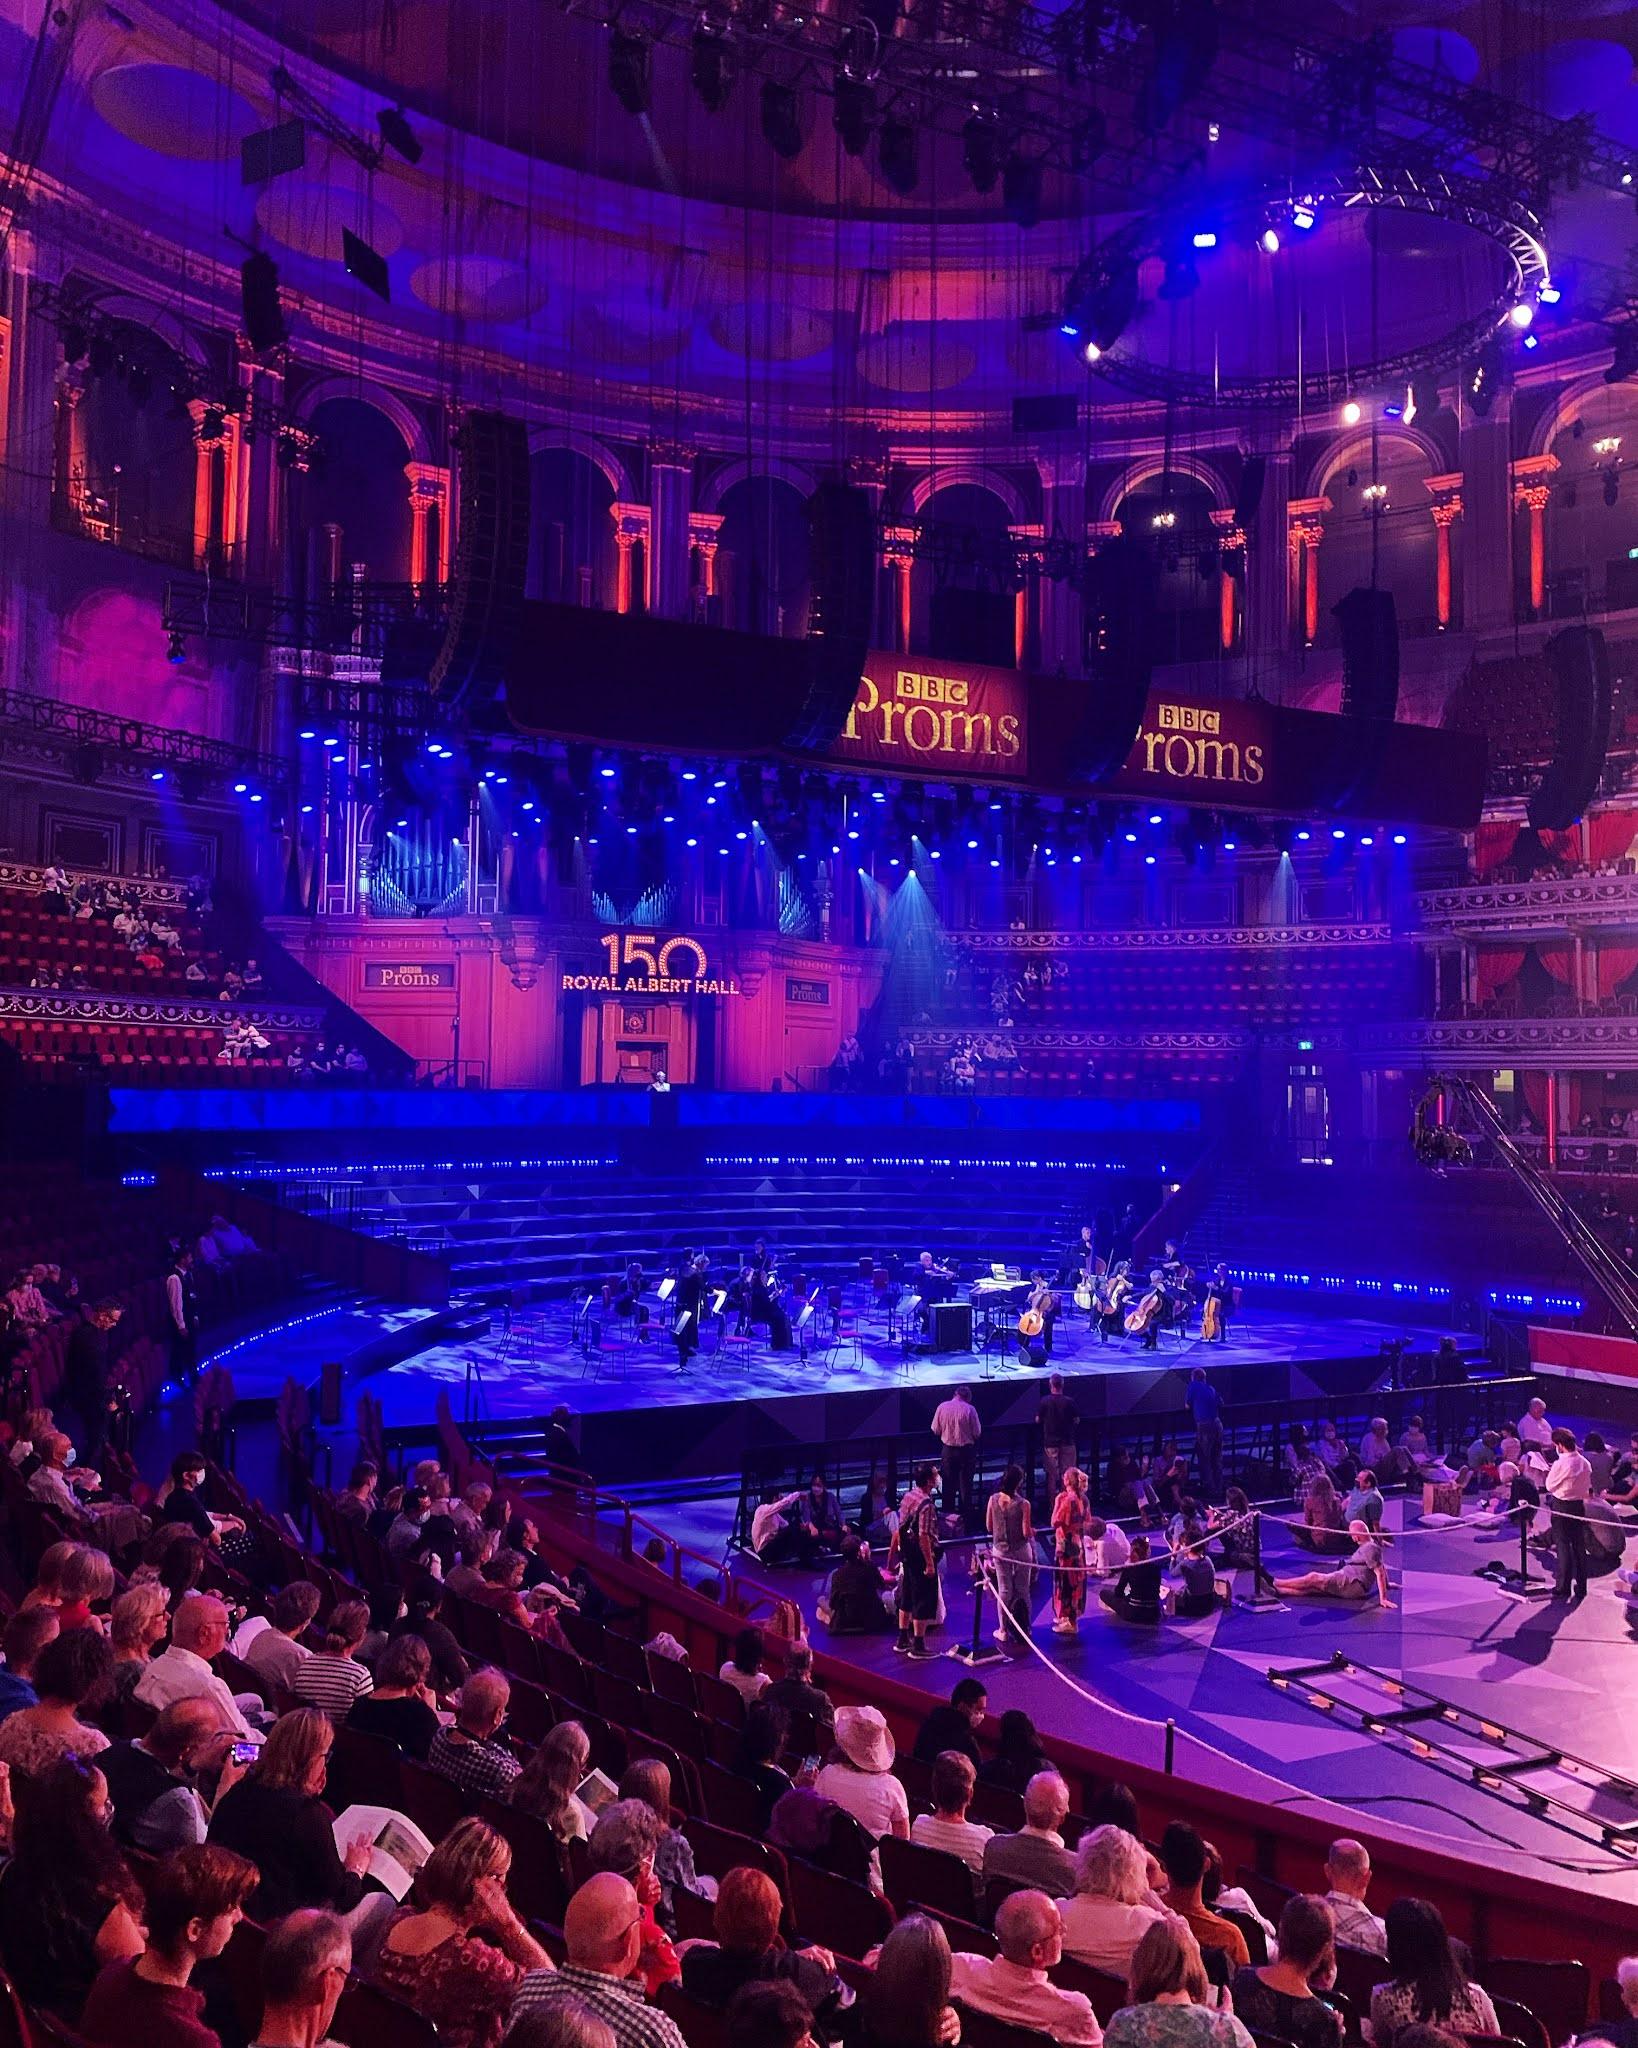 BBC Proms 2021 at the Royal Albert Hall - London lifestyle blog